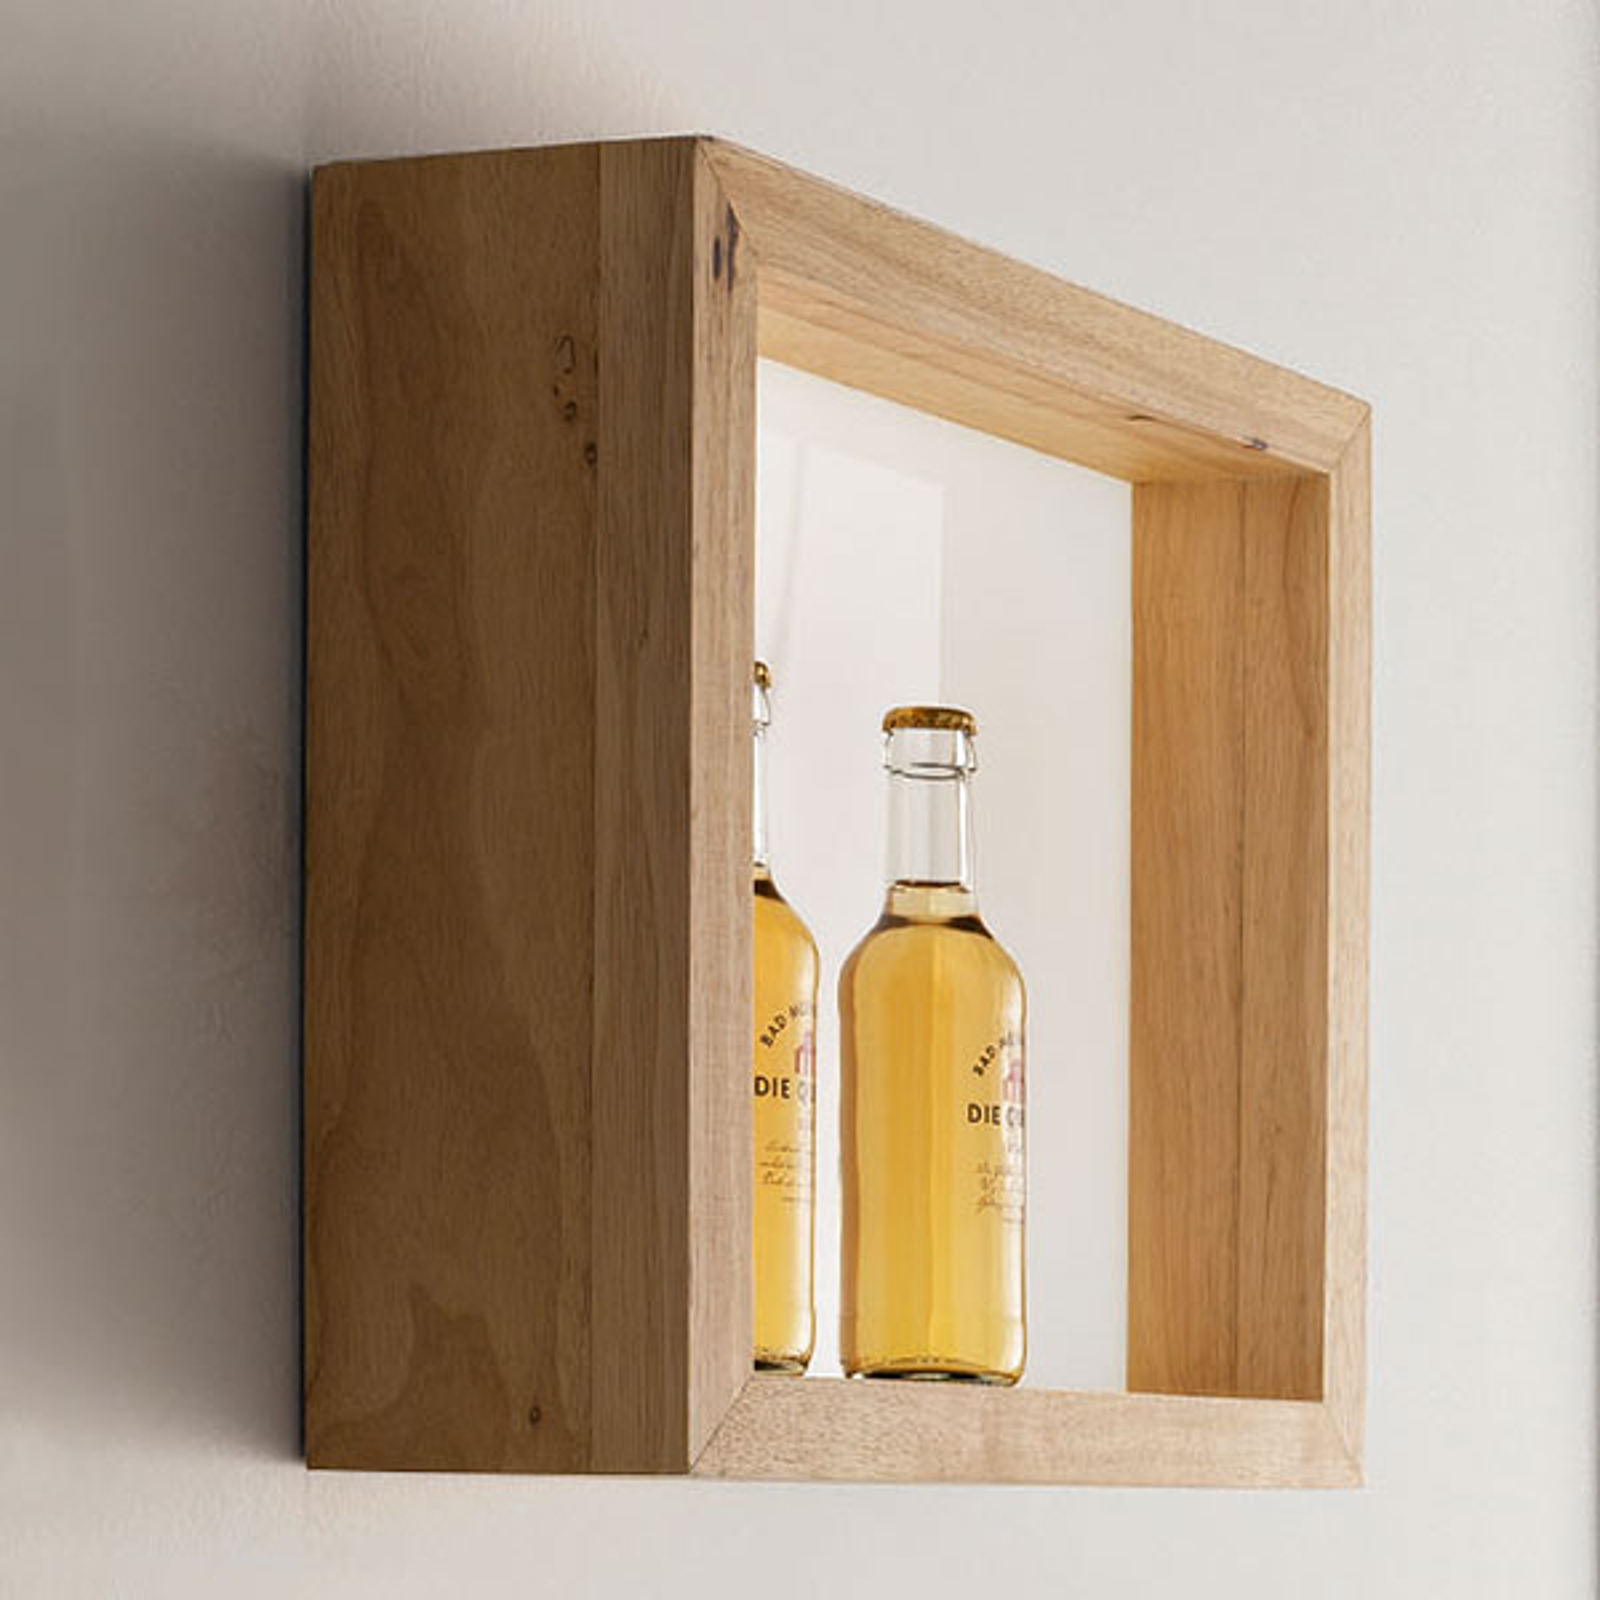 LED-Wandleuchte Window, 37 x 37 cm, Eichenholz